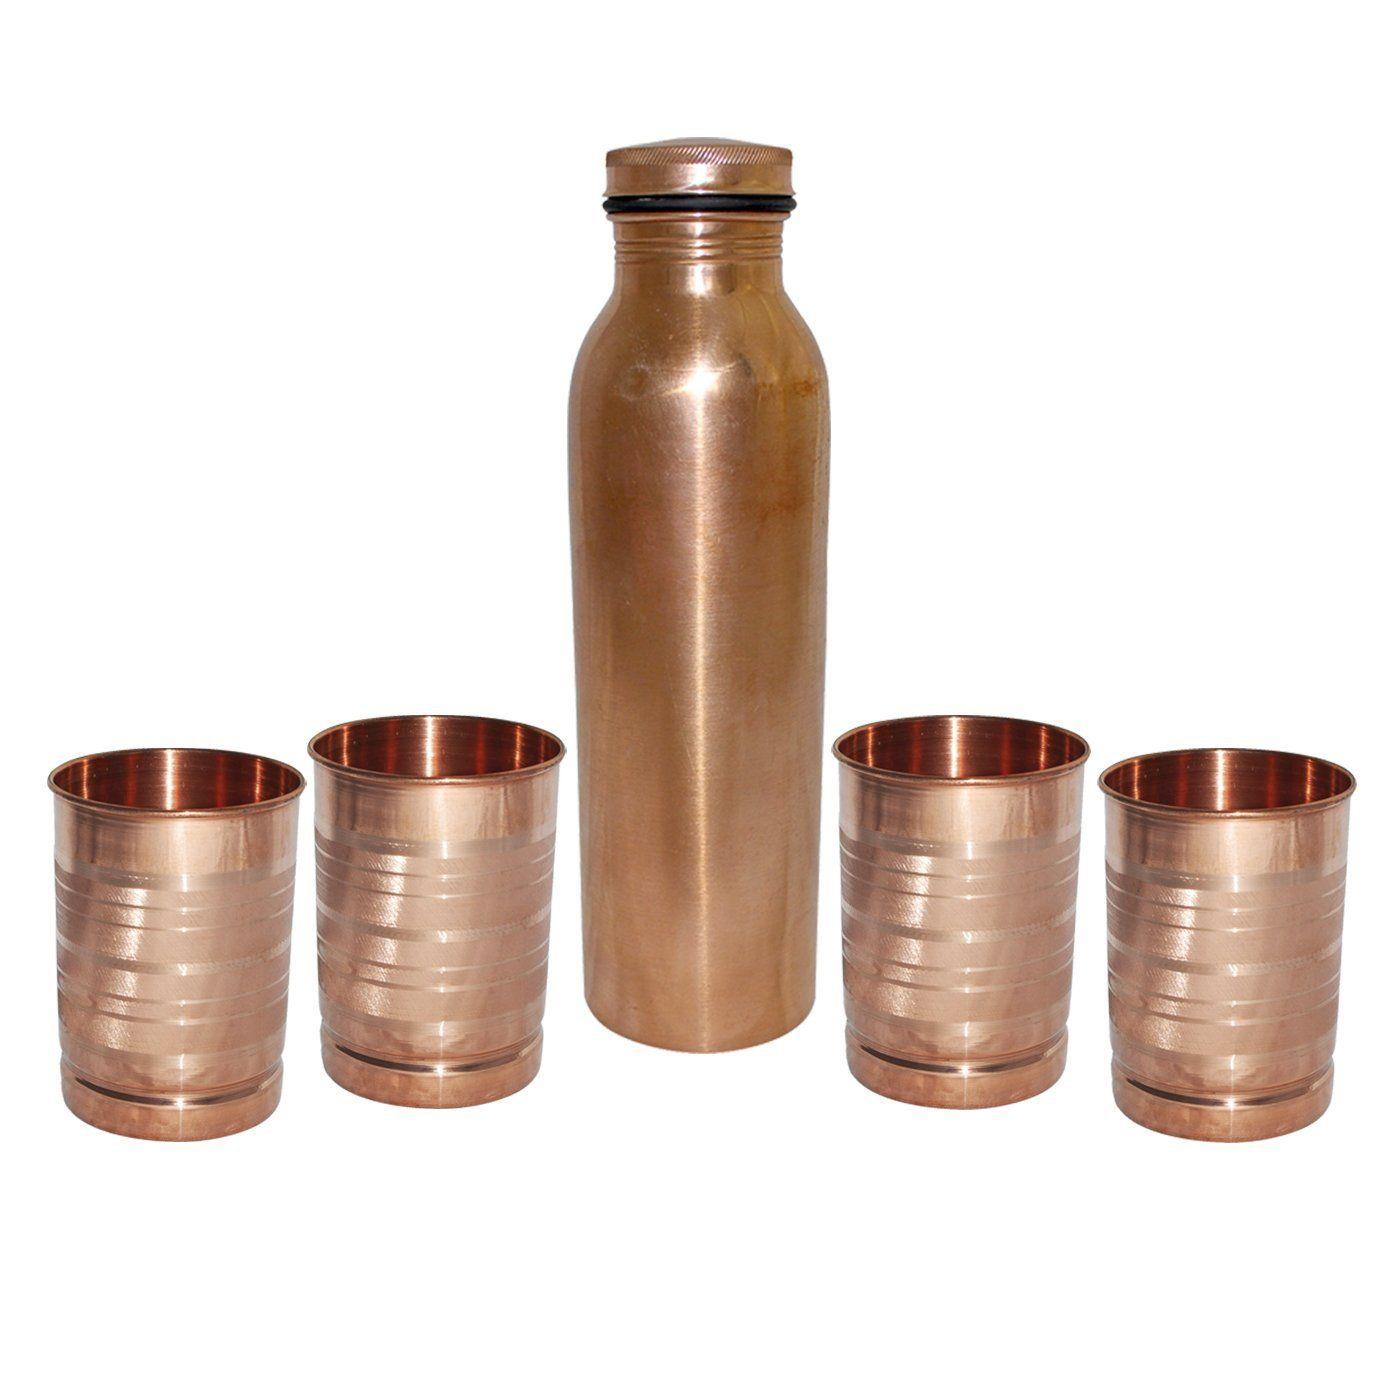 DakshCraft ® Handmade Copper Thermos Bottle